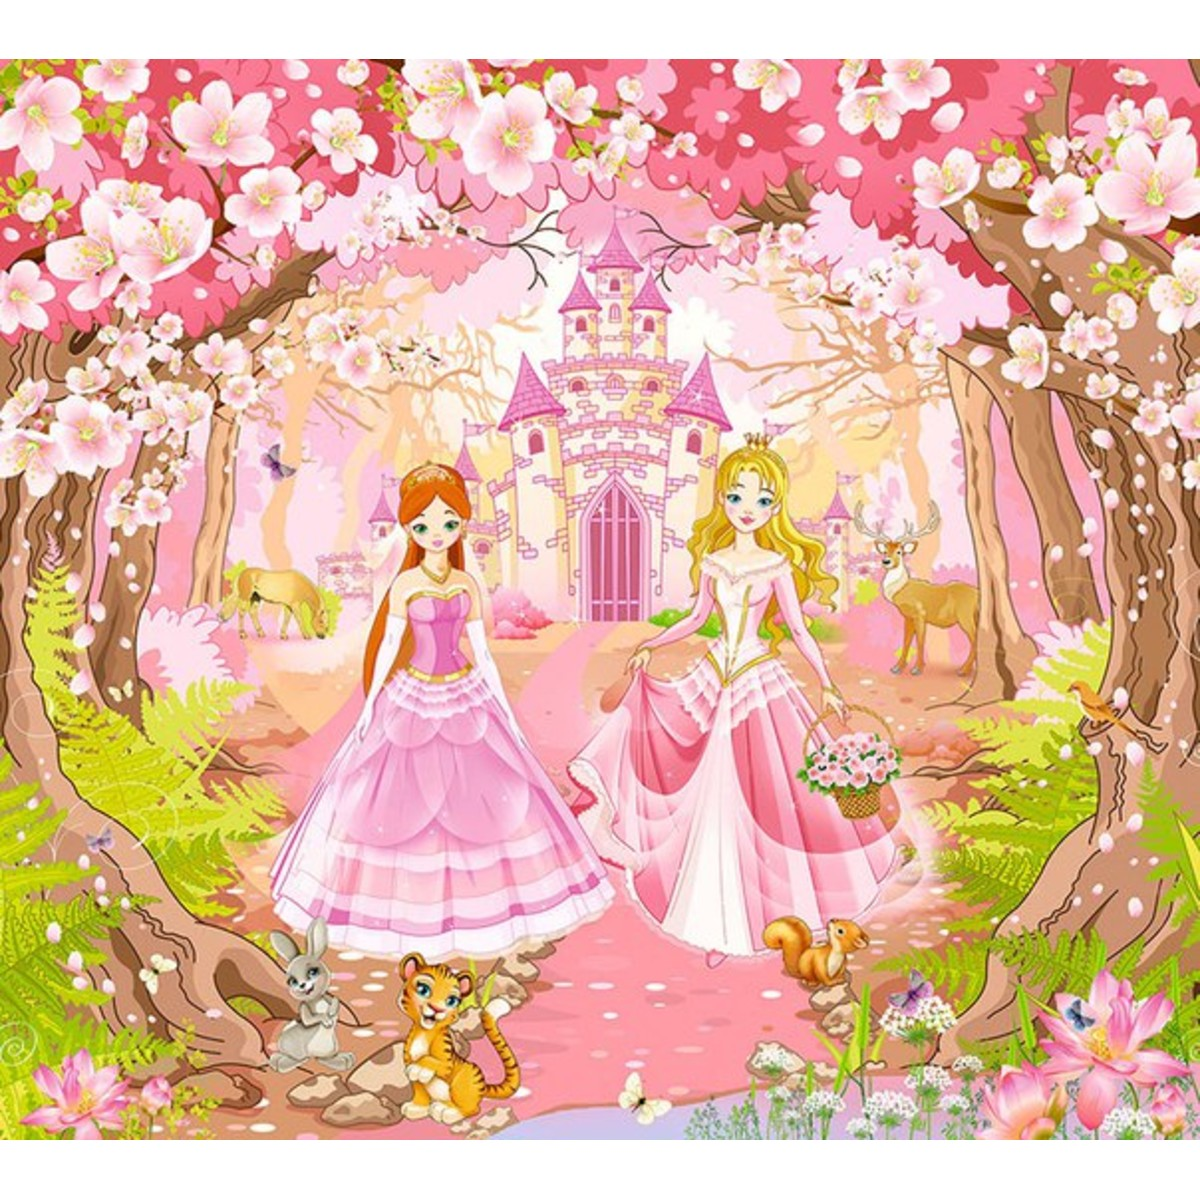 Фотообои DeliceDecor Принцессы Ф 065 300х270 см